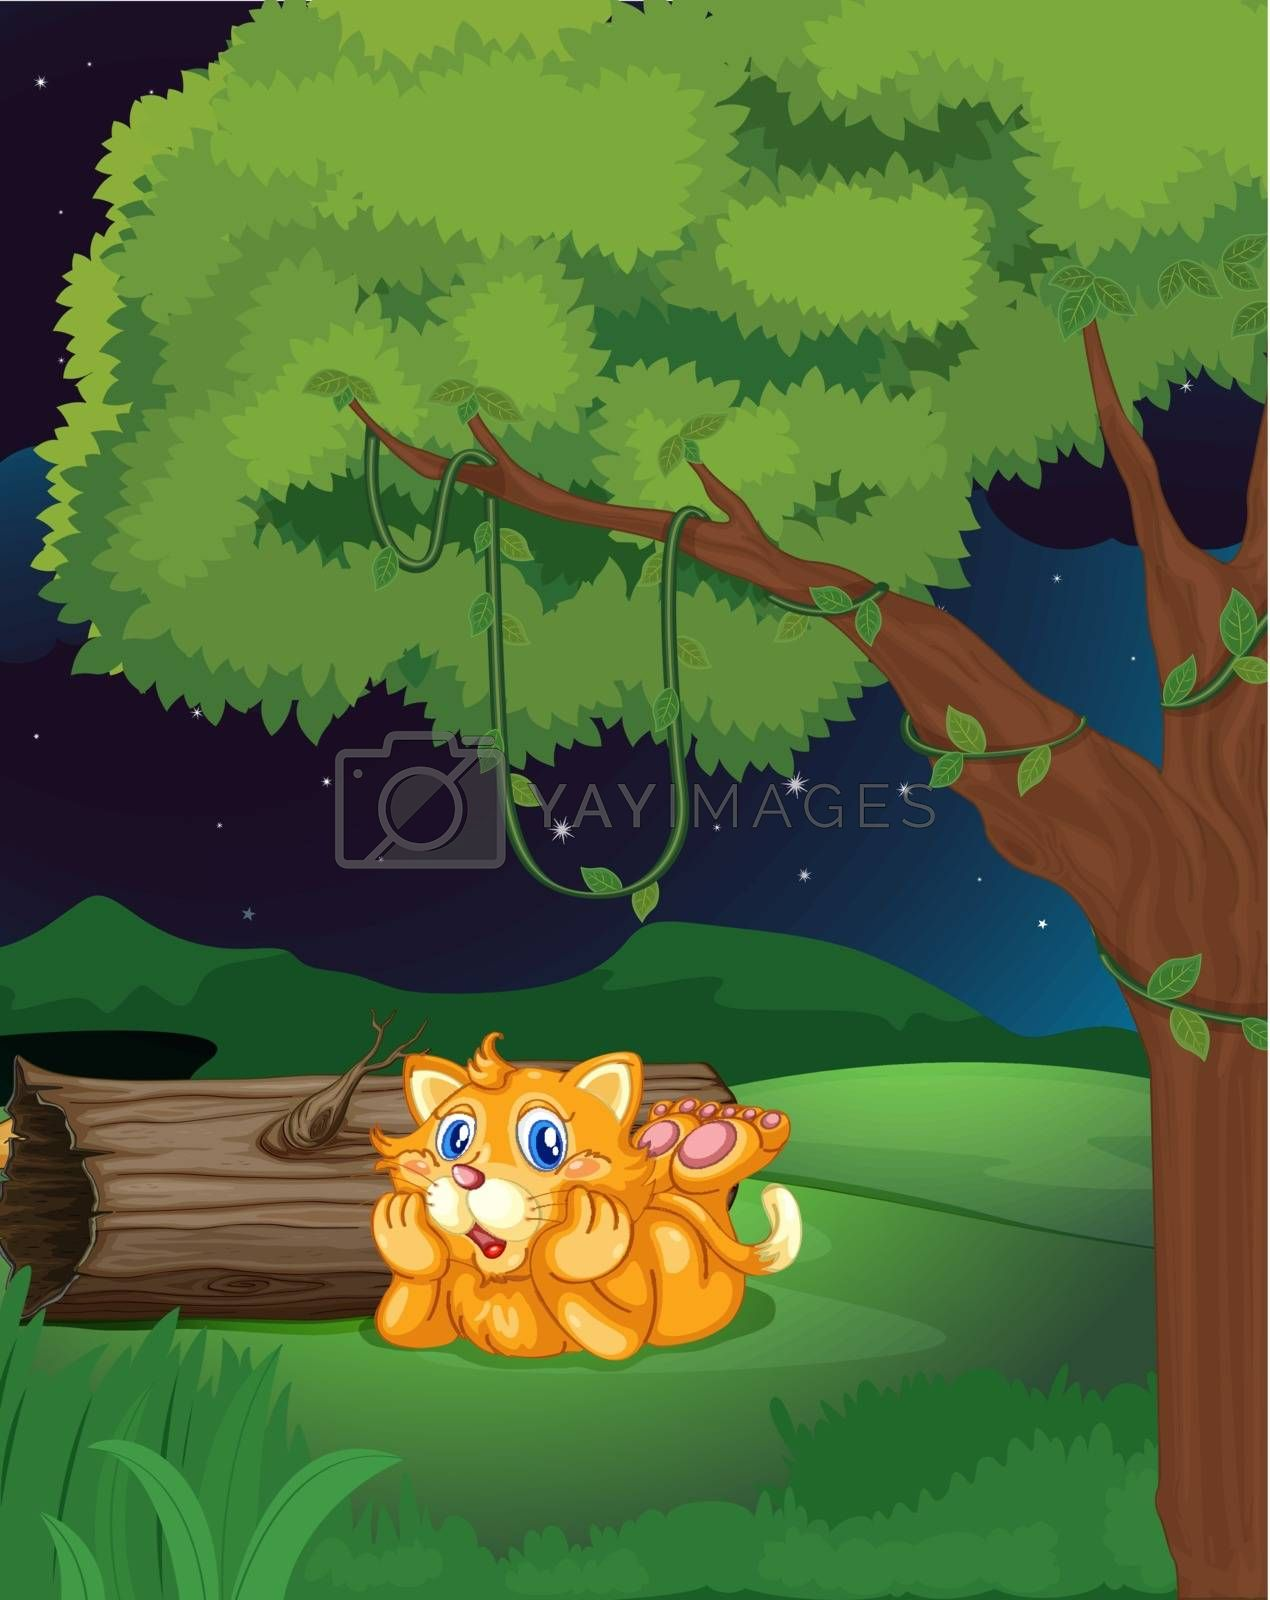 Illustration of a cat lying under a tree in a dark night